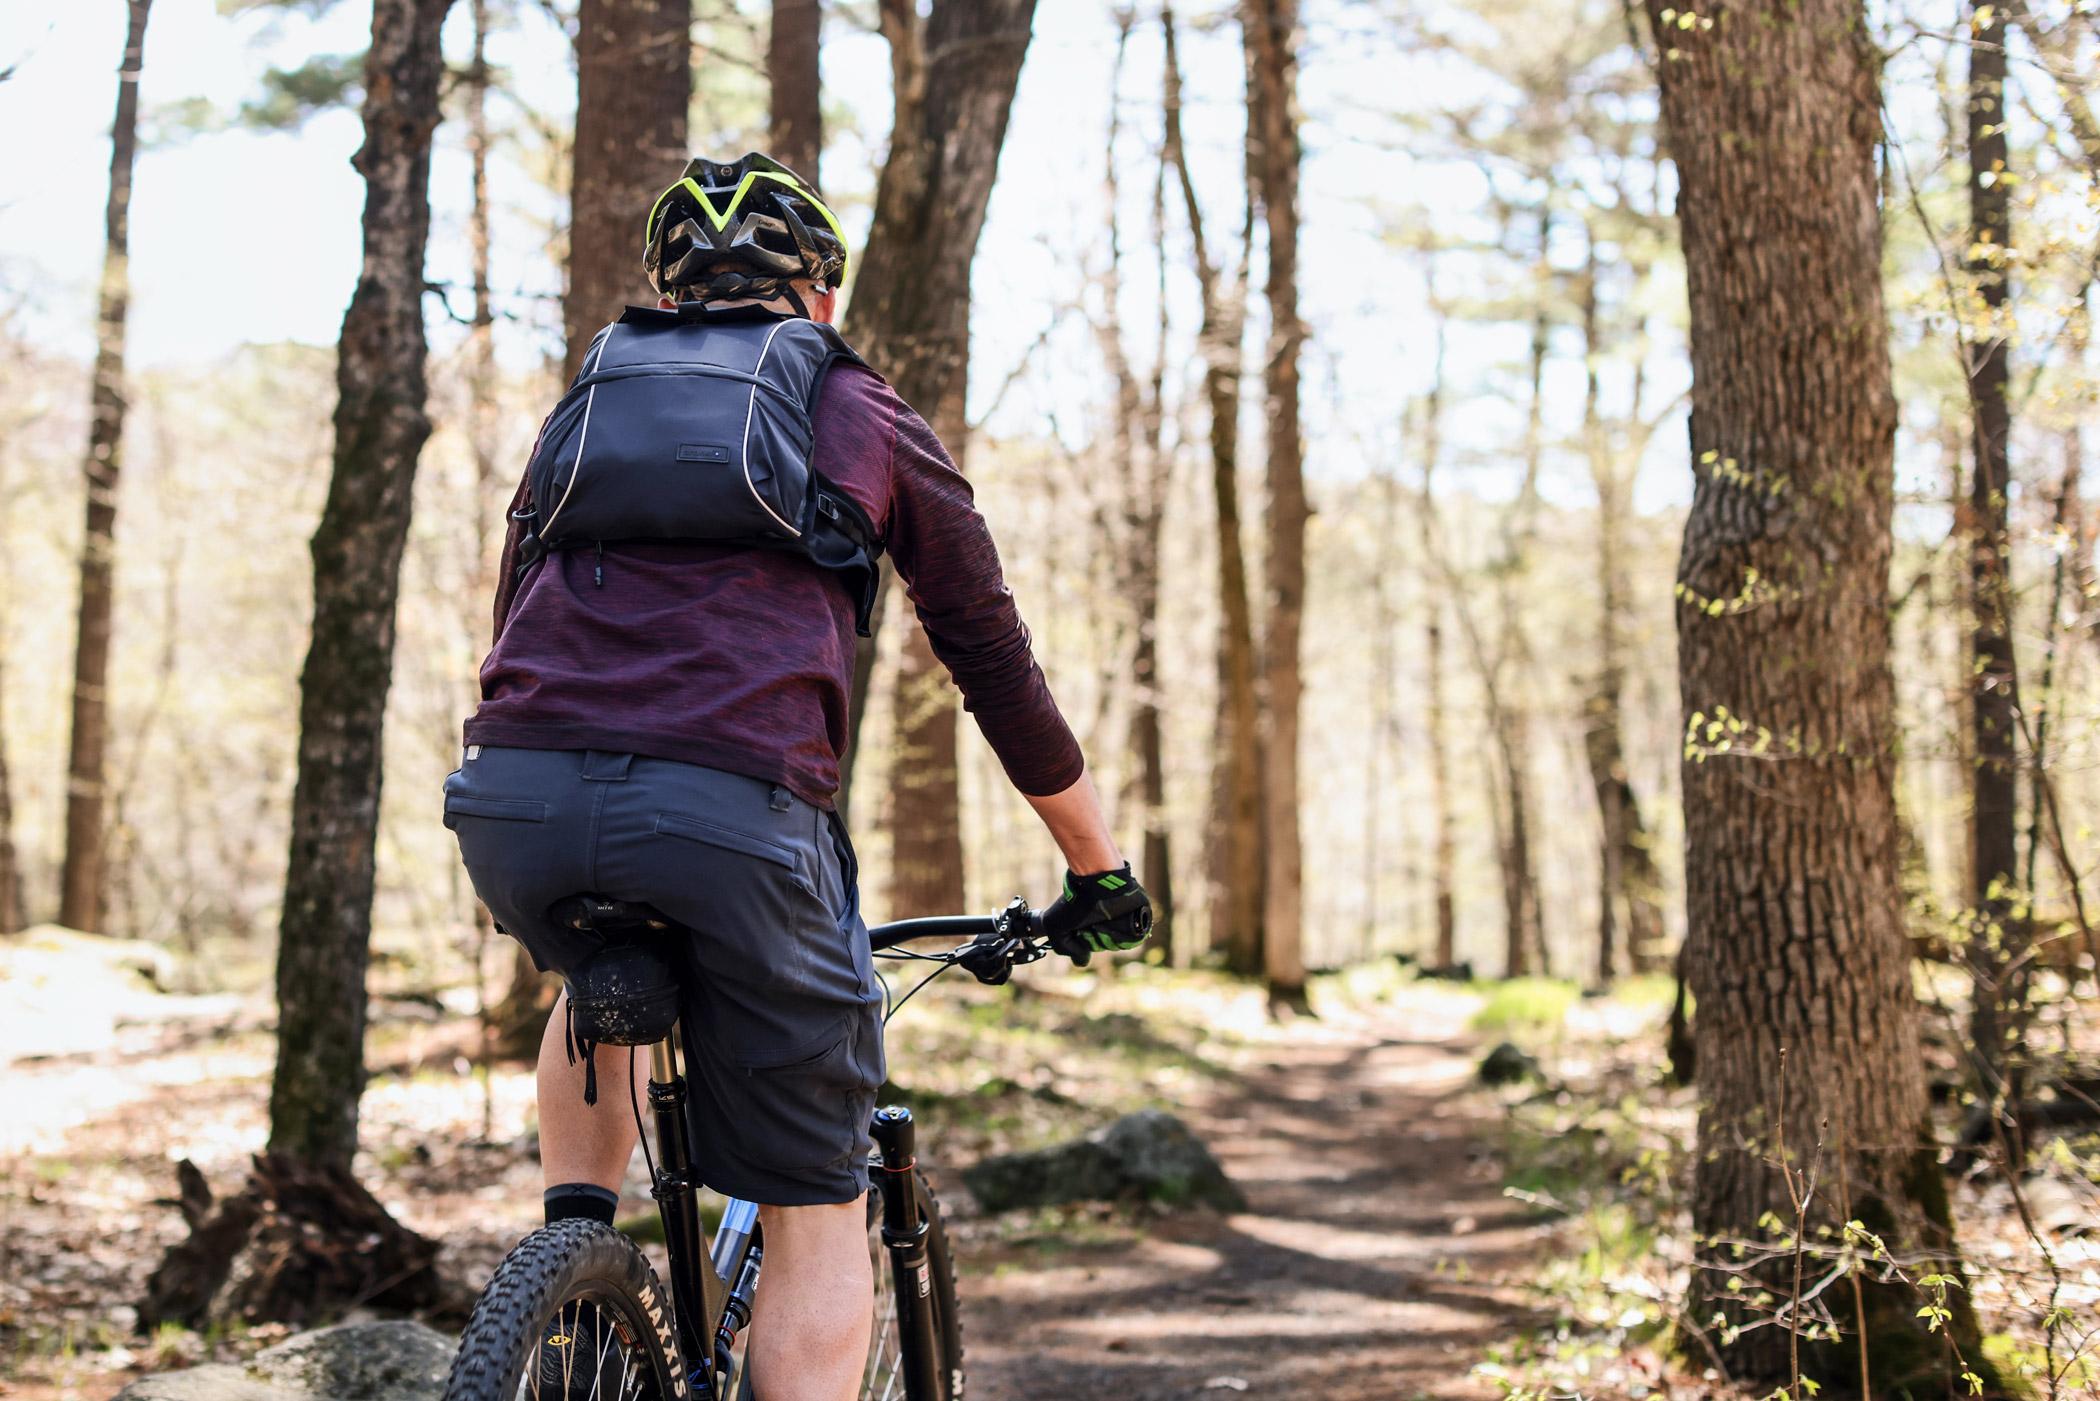 hydration-vest-mountain-bike-best-quality